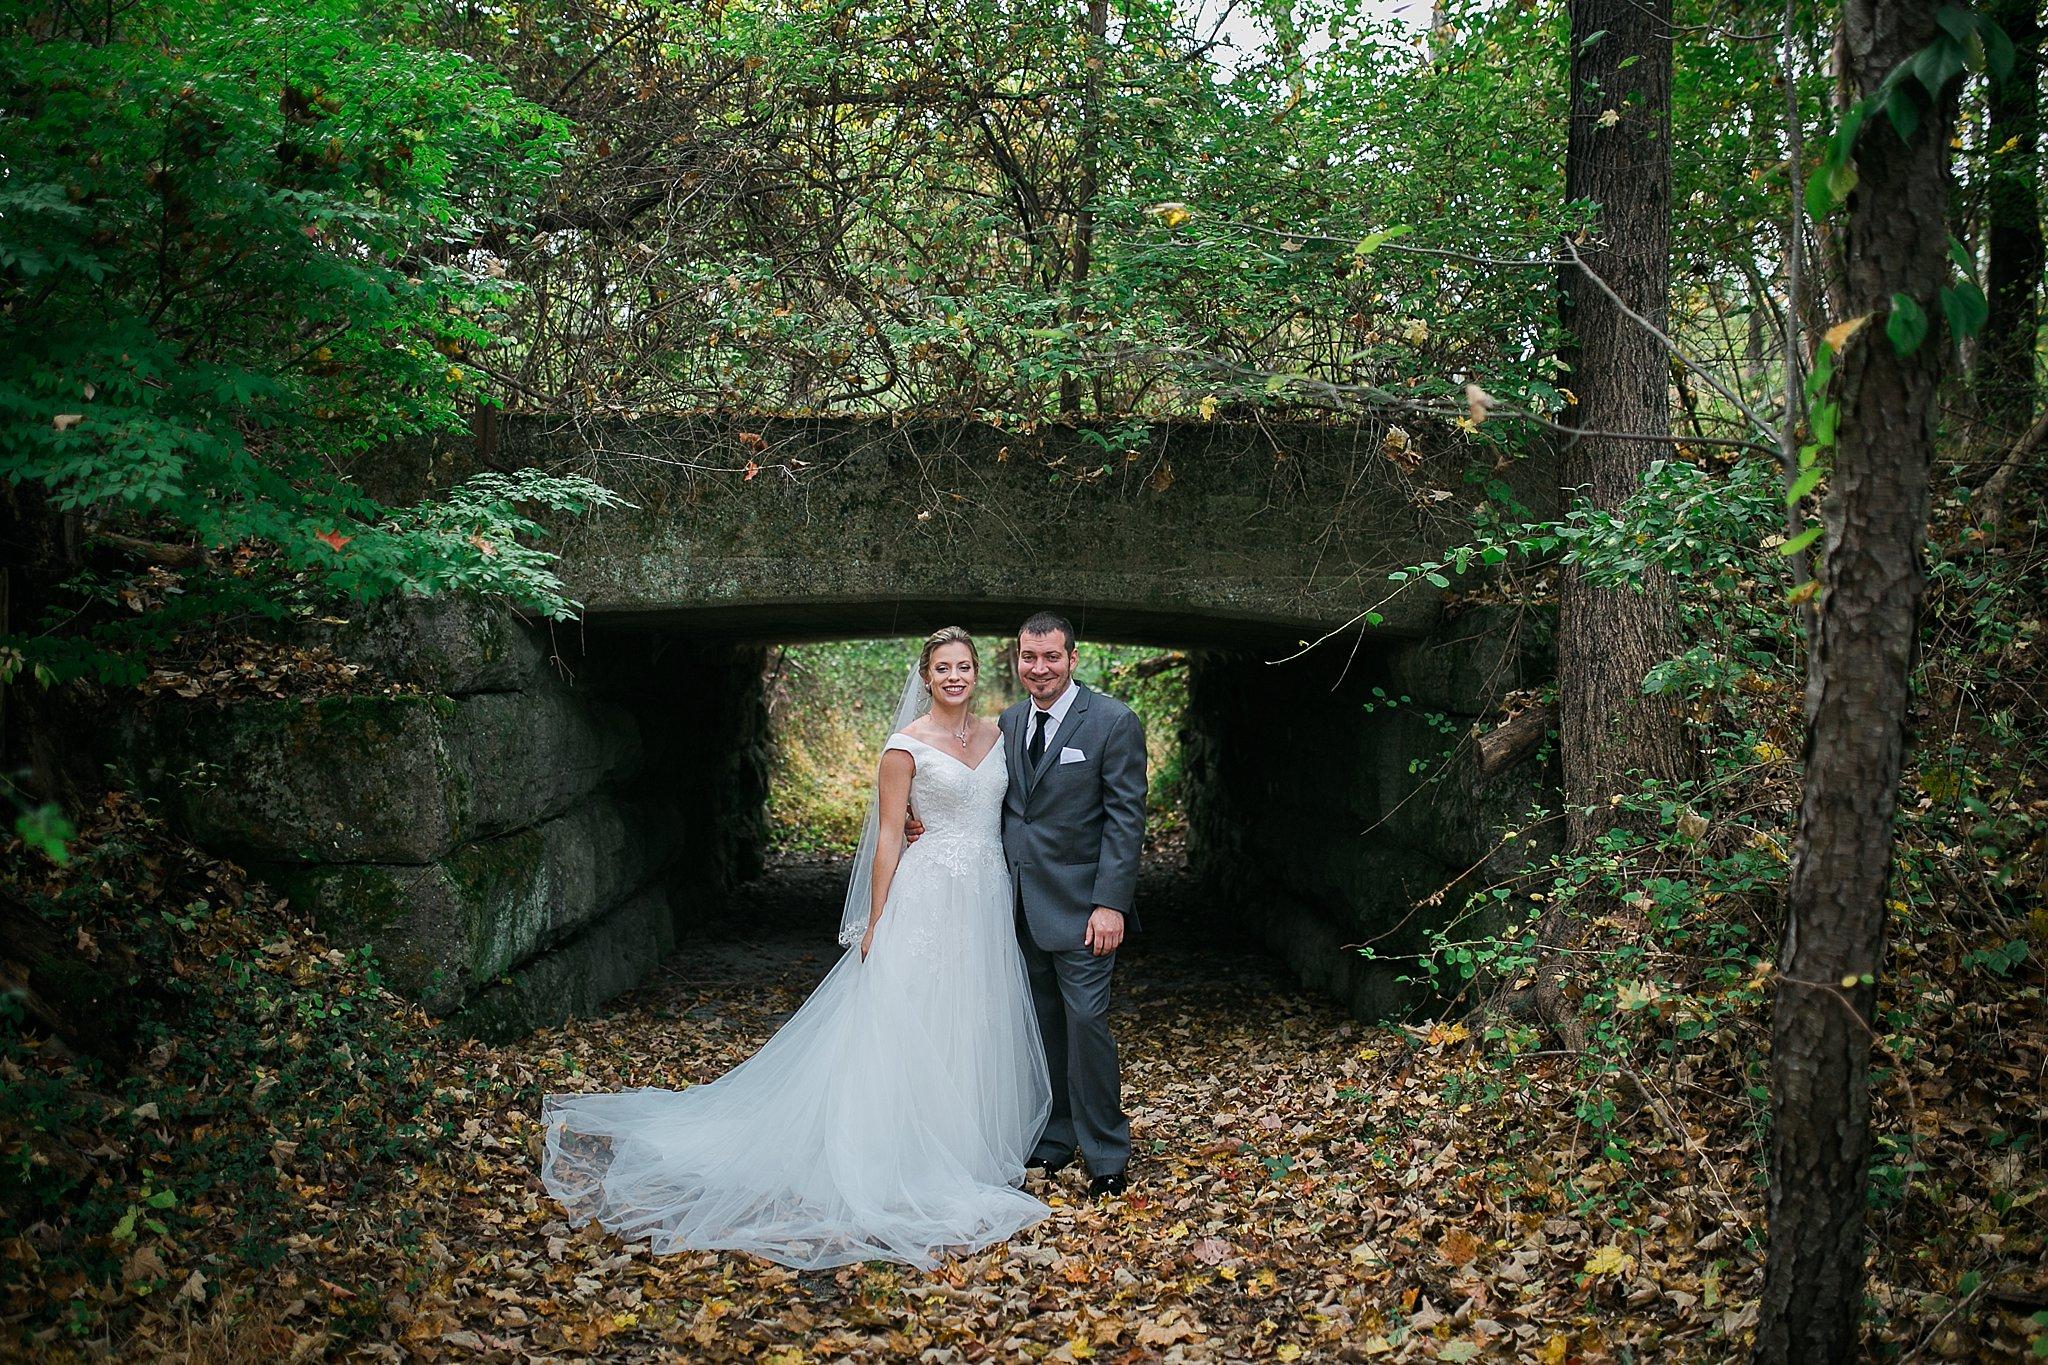 New Windsor New York Hudson Valley New York Wedding Photographer 26.jpg